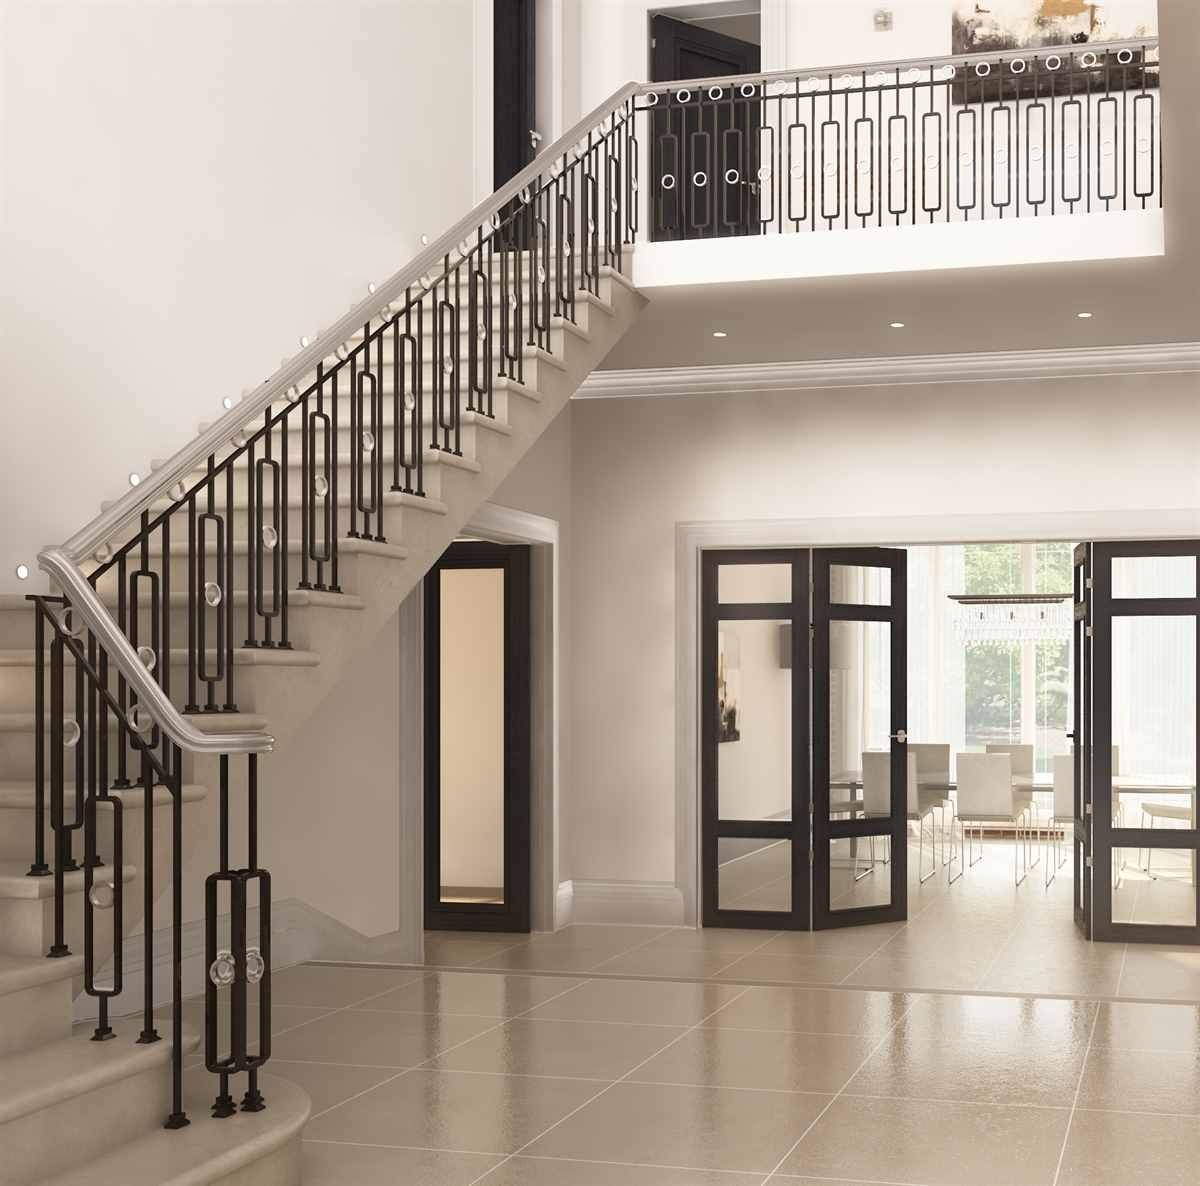 Best Fabricated Mild Steel Balustrade With Oak Handrail 400 x 300